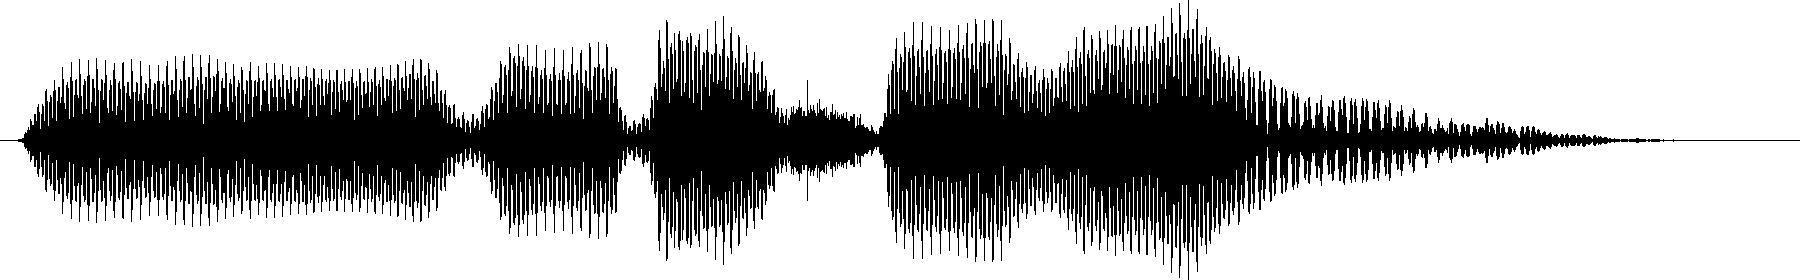 alvinbary 17